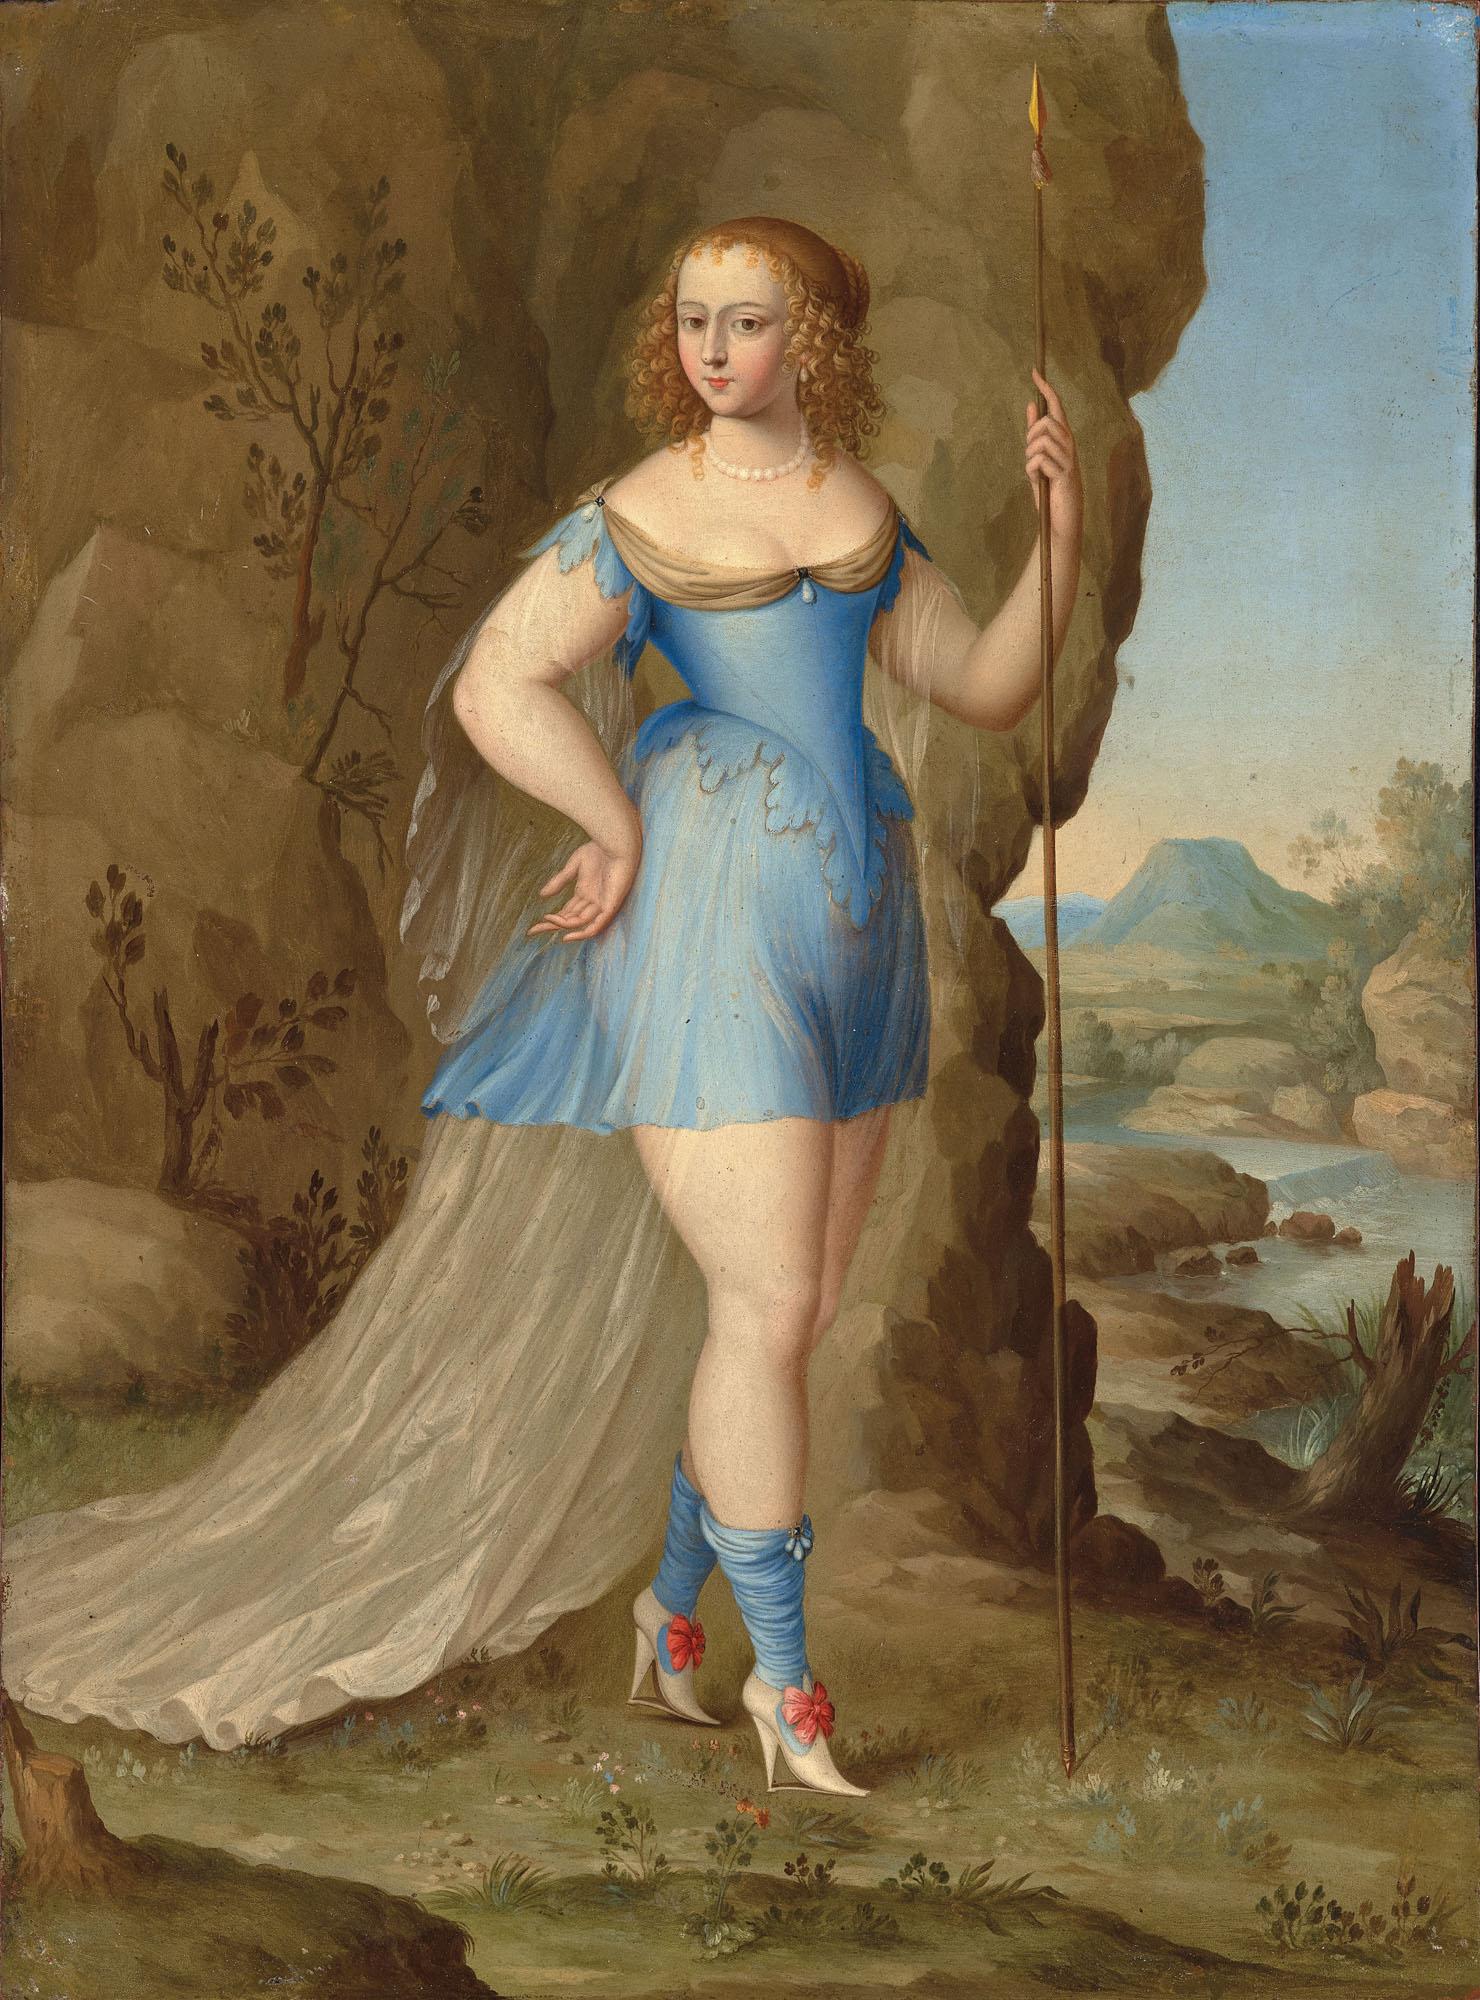 JOSEPH WERNER (BERNE 1637-1710)